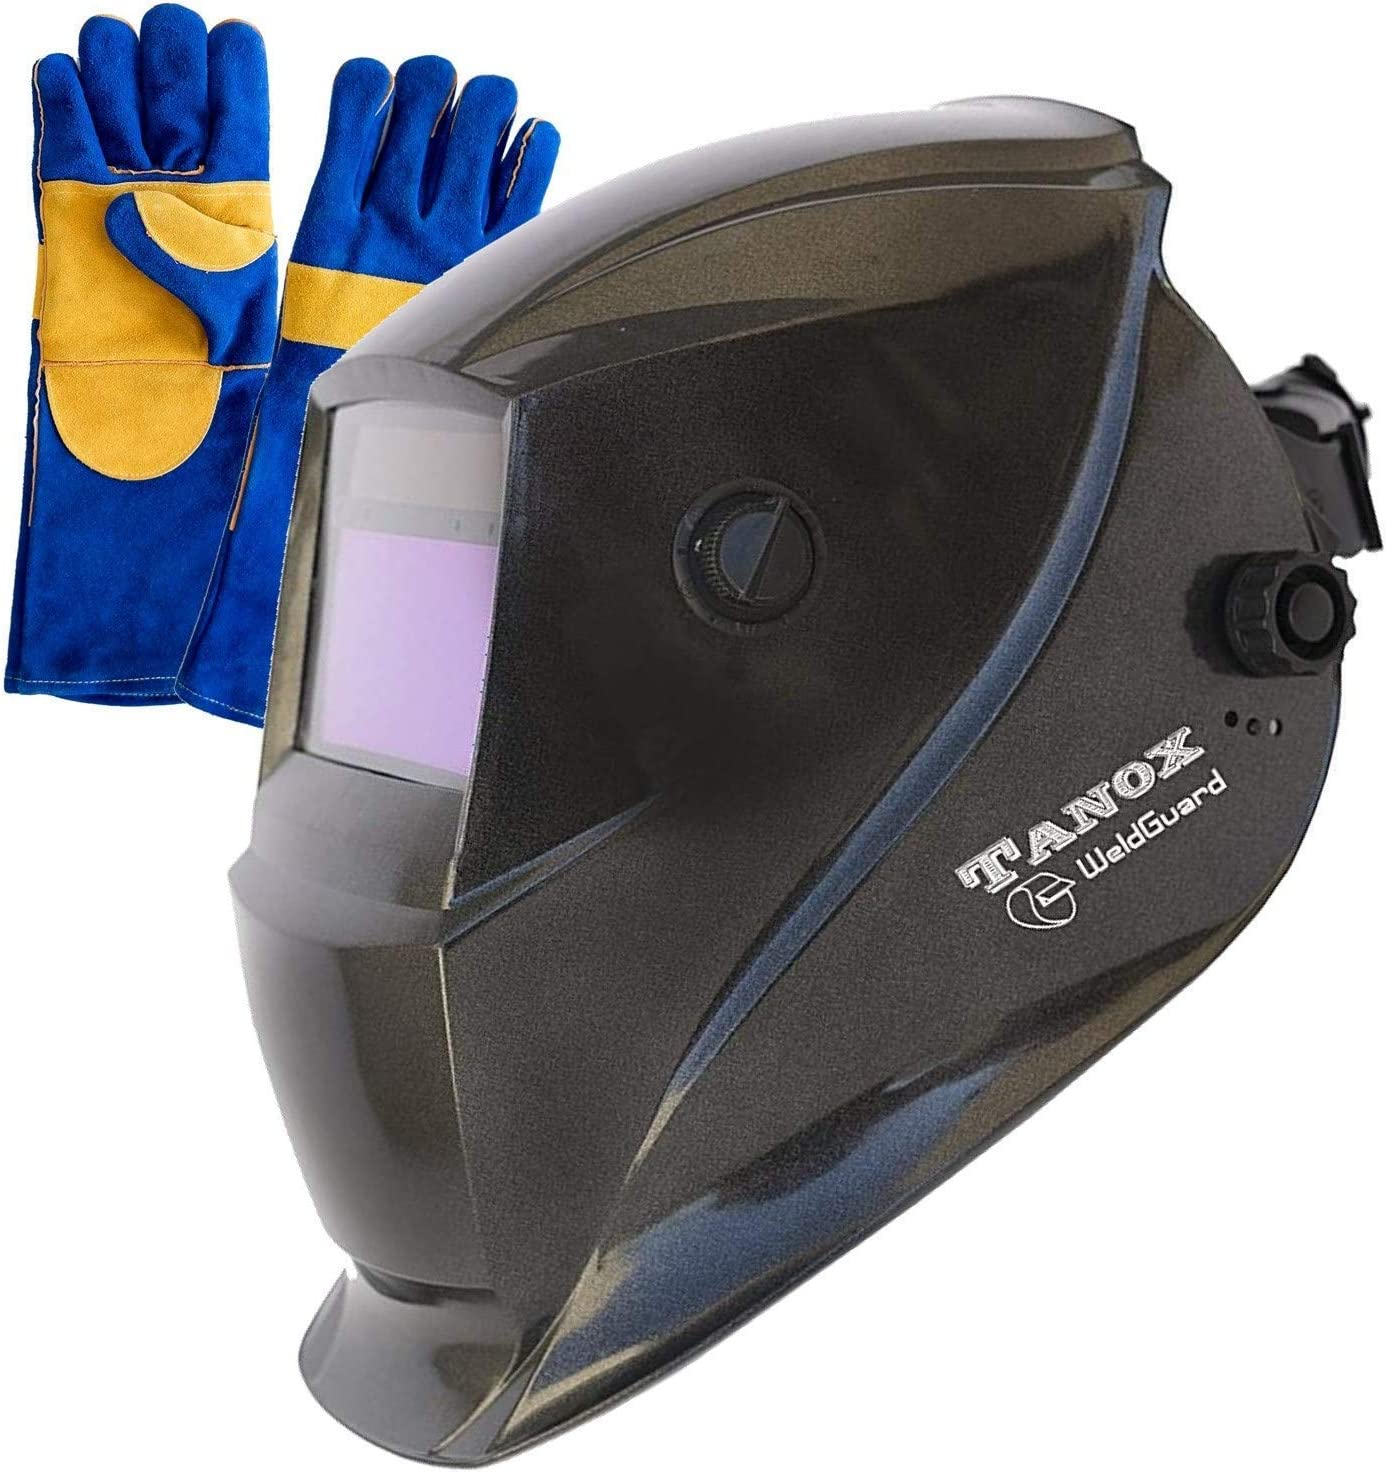 Tanox Auto Darkening Solar Powered Welding Helmet ADF-206S: Shade ...